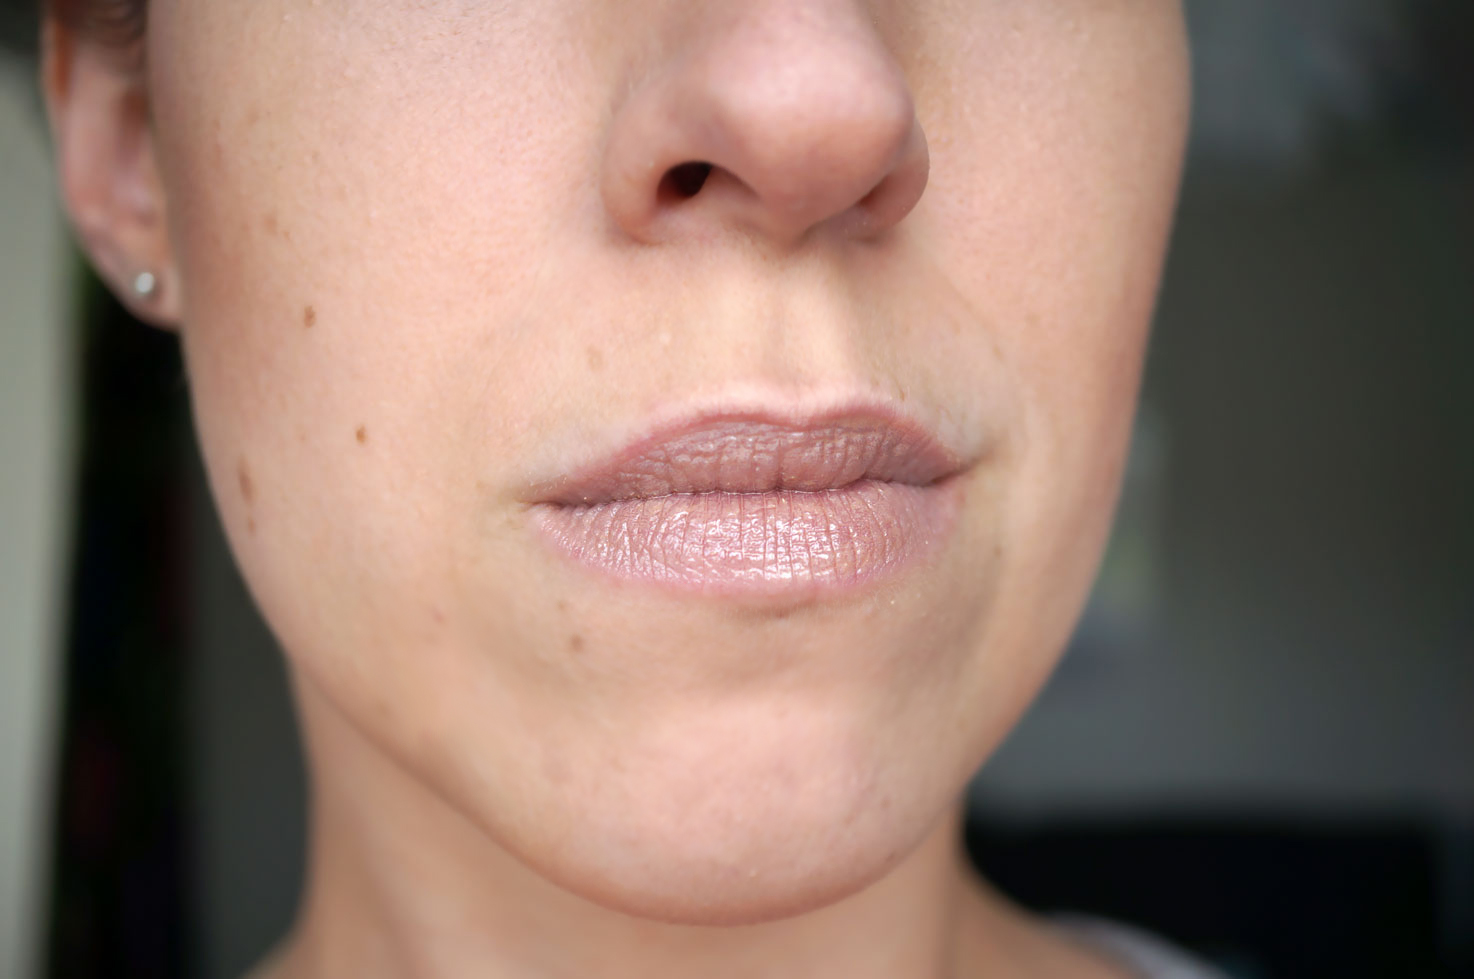 pedro lourenco lip gloss